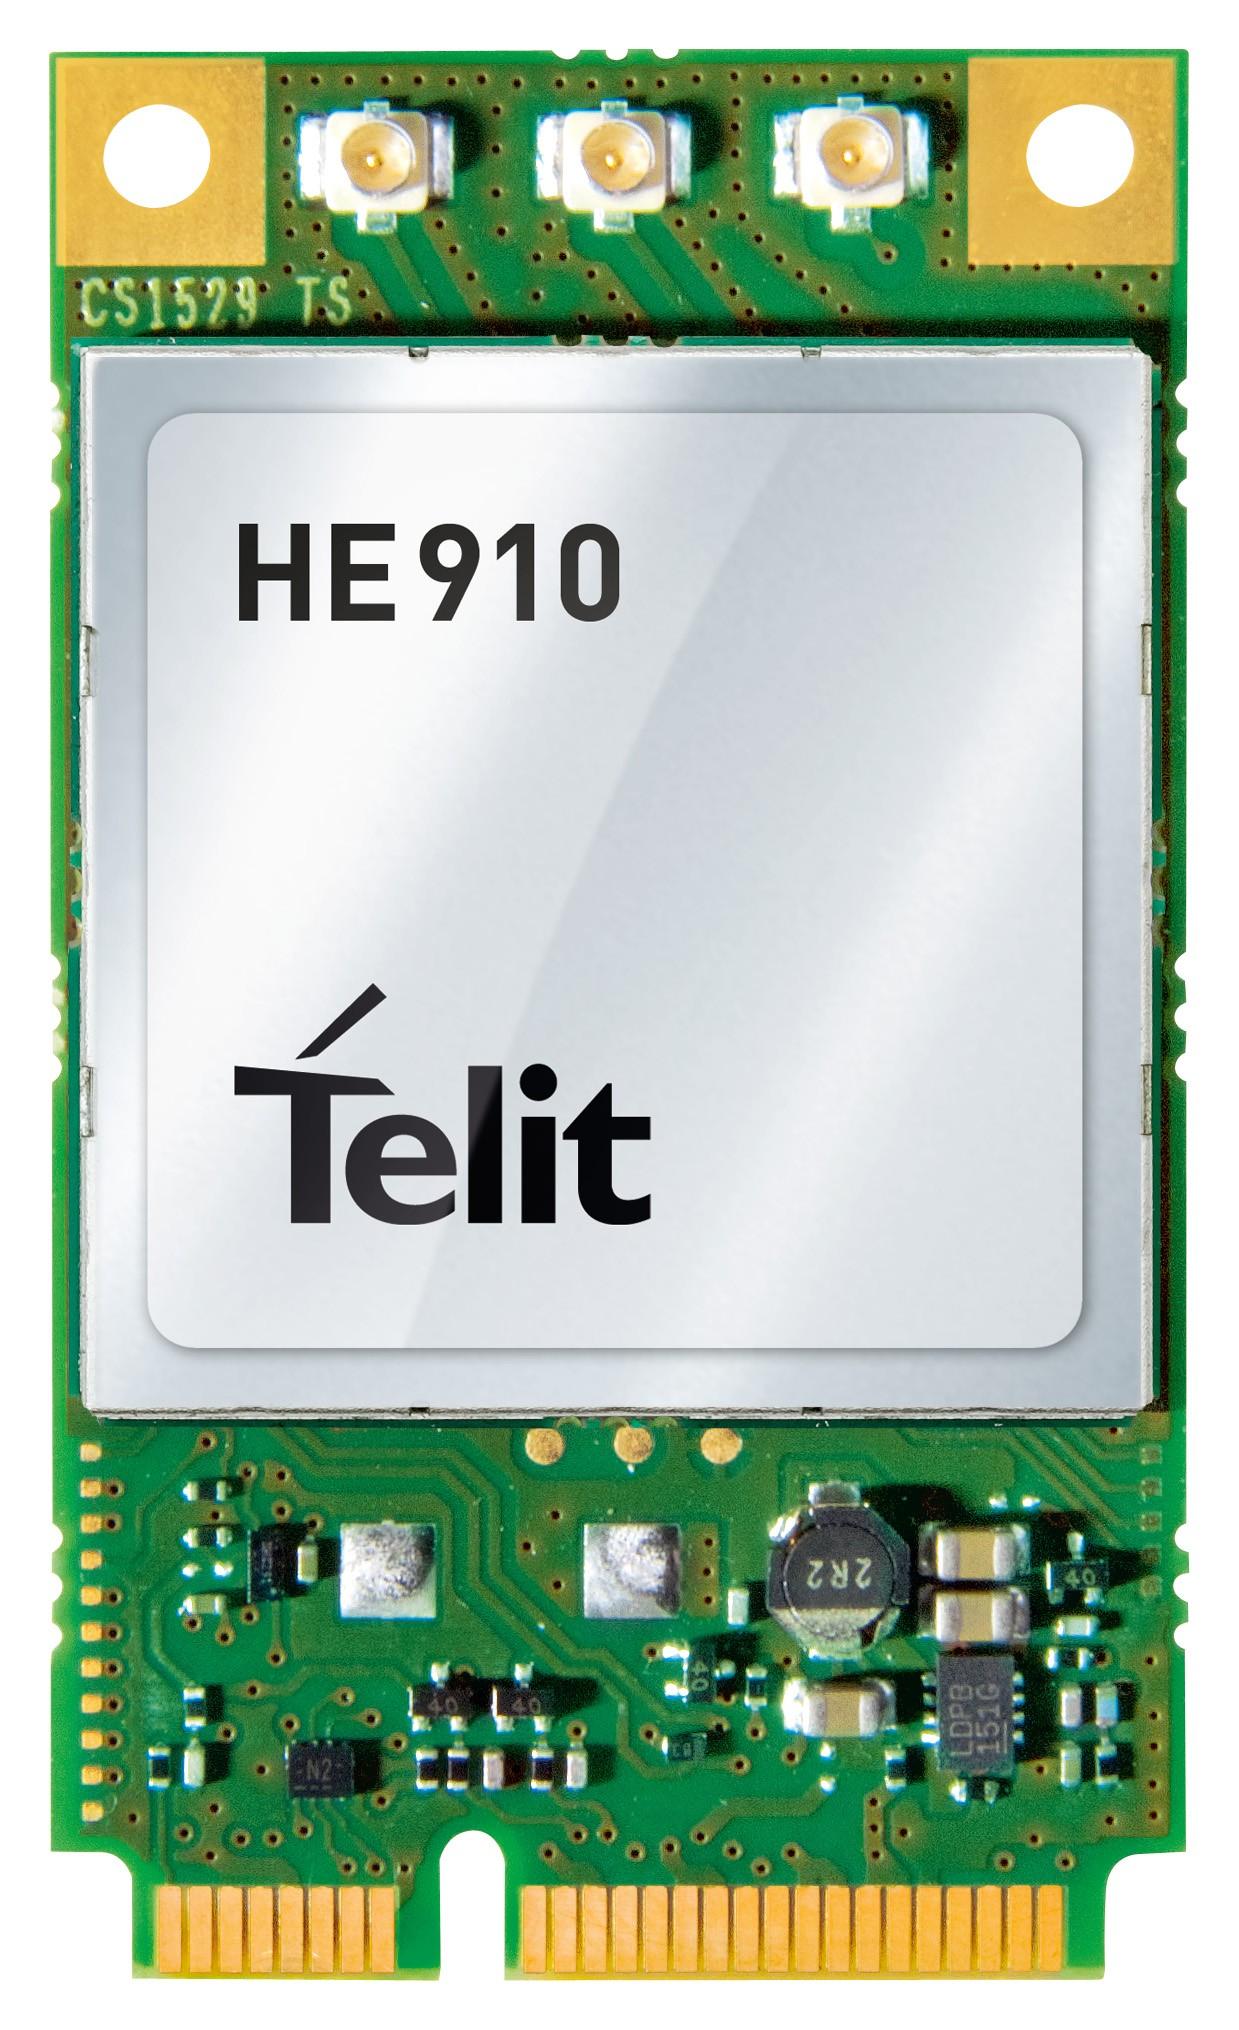 HE910-D miniPCIe (HE910-D no SIM-holder)